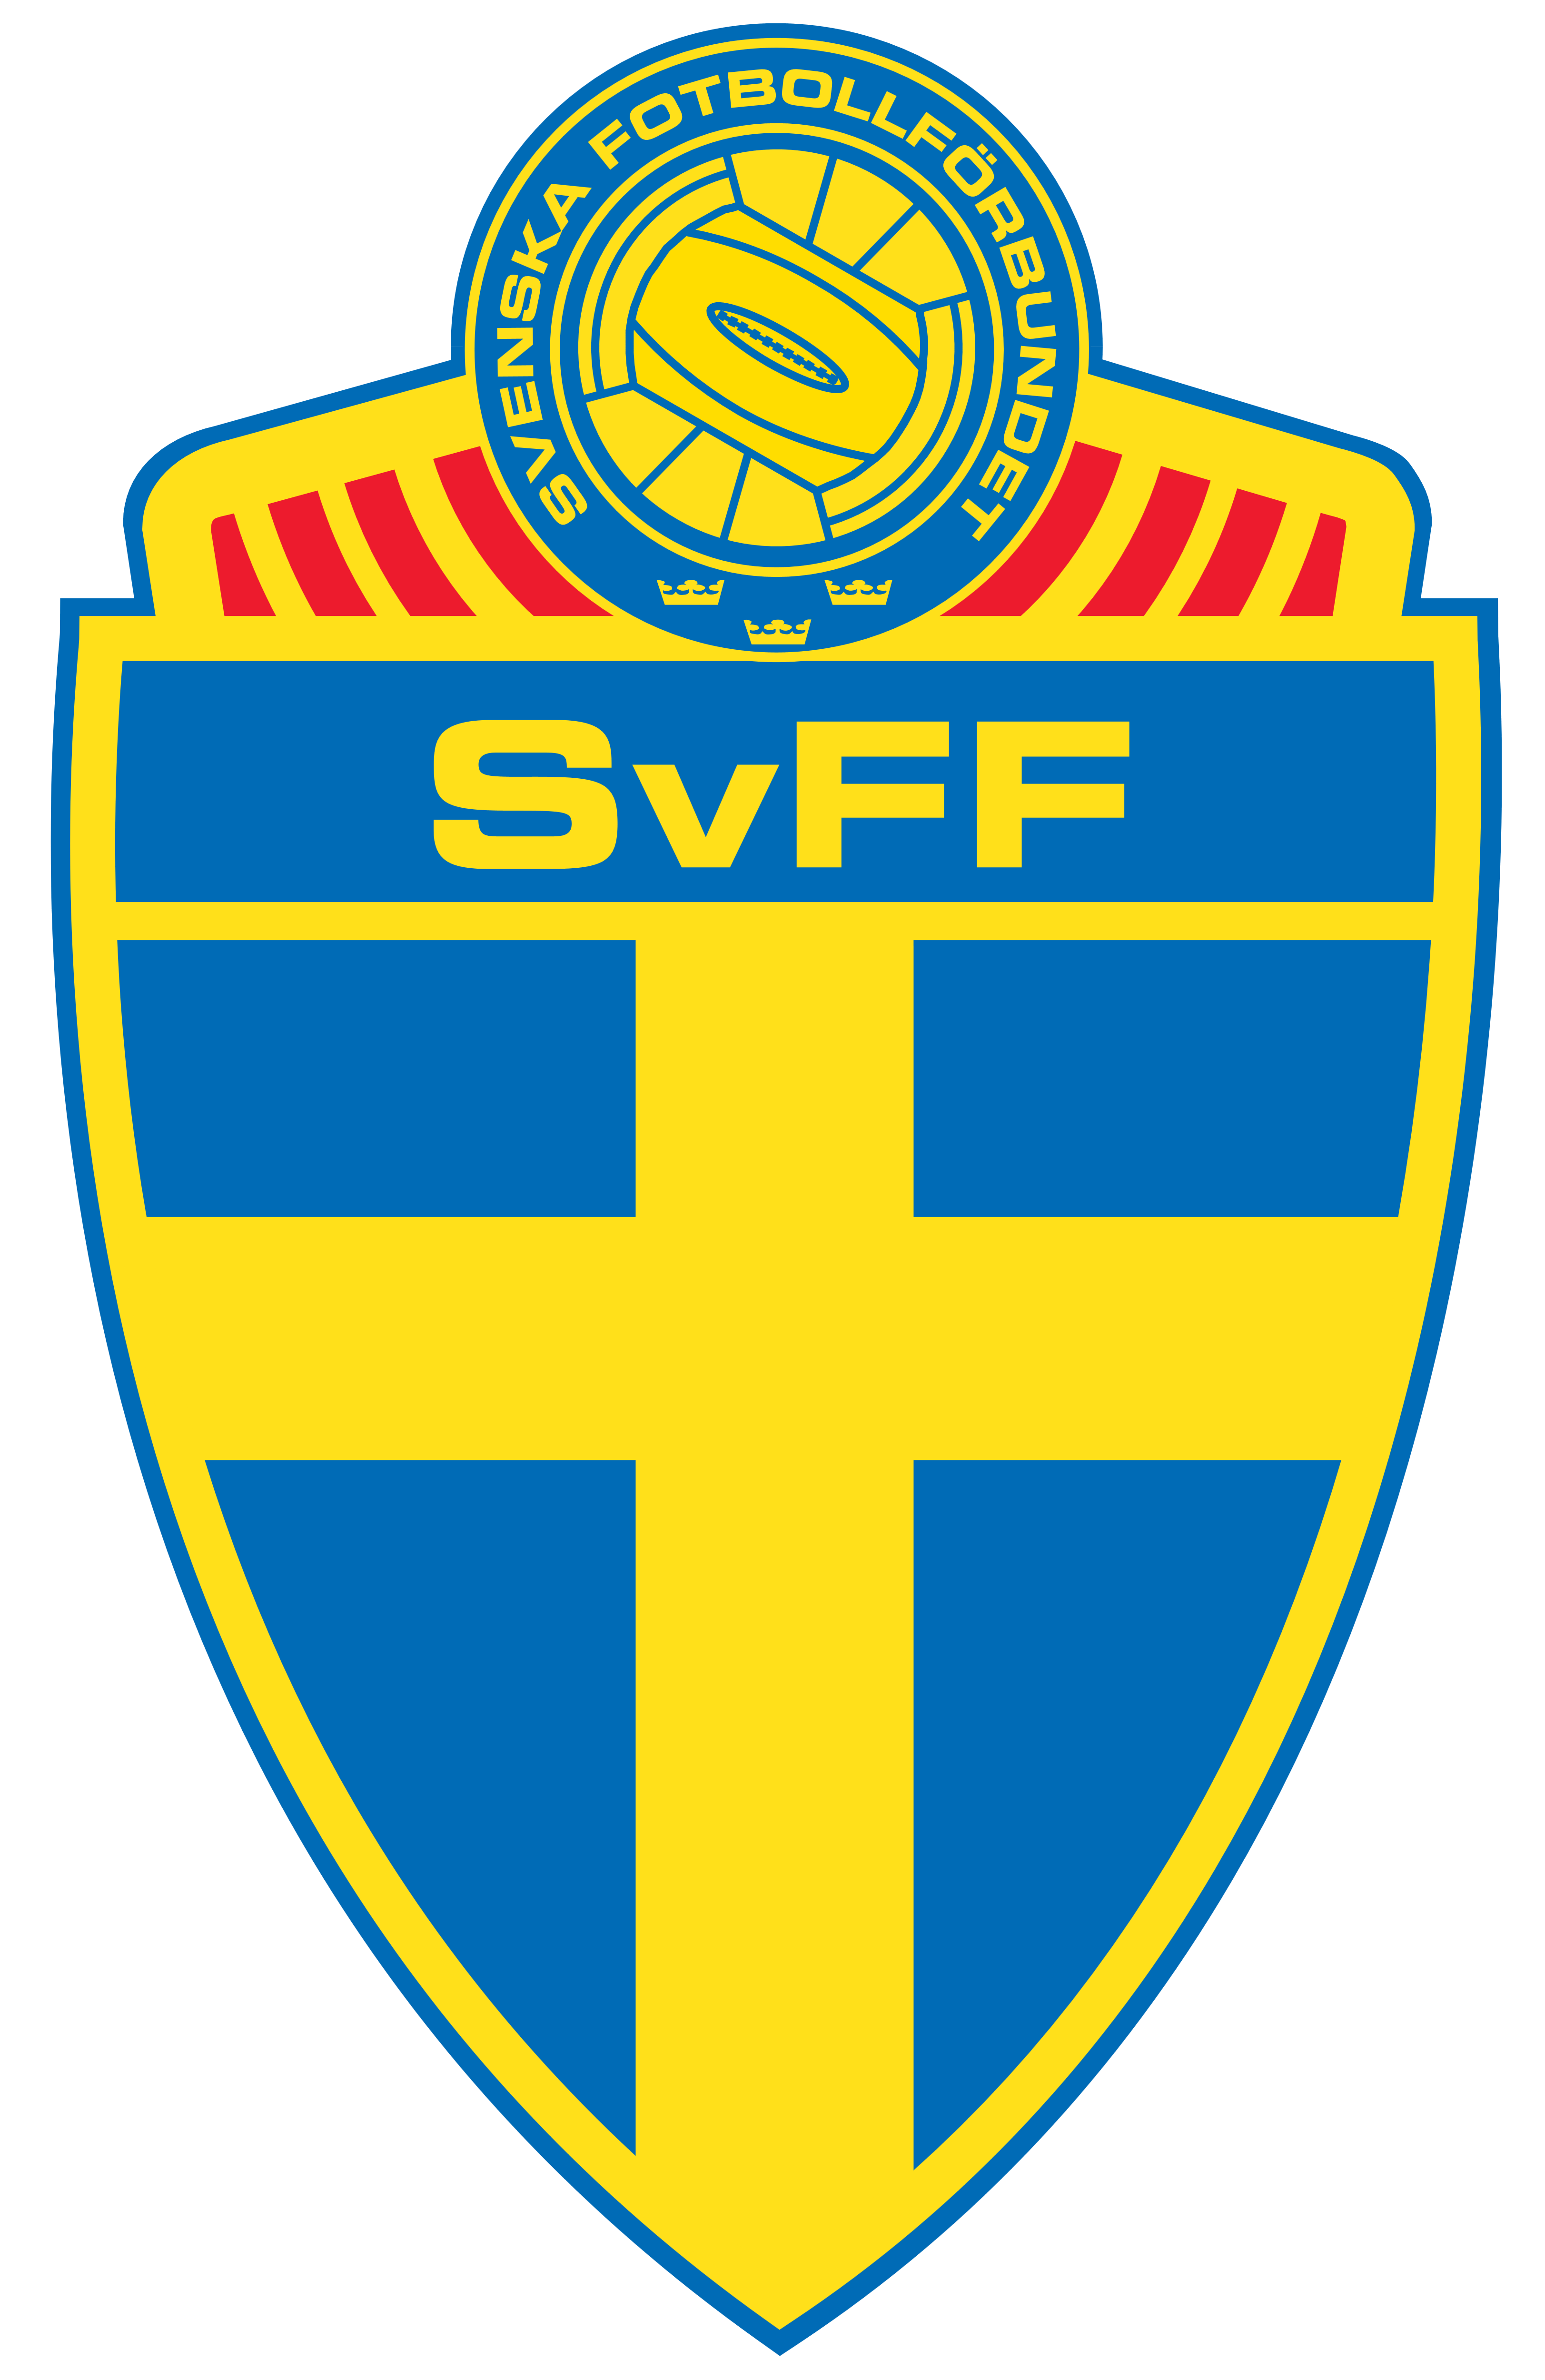 Federation cup 2020 fussball